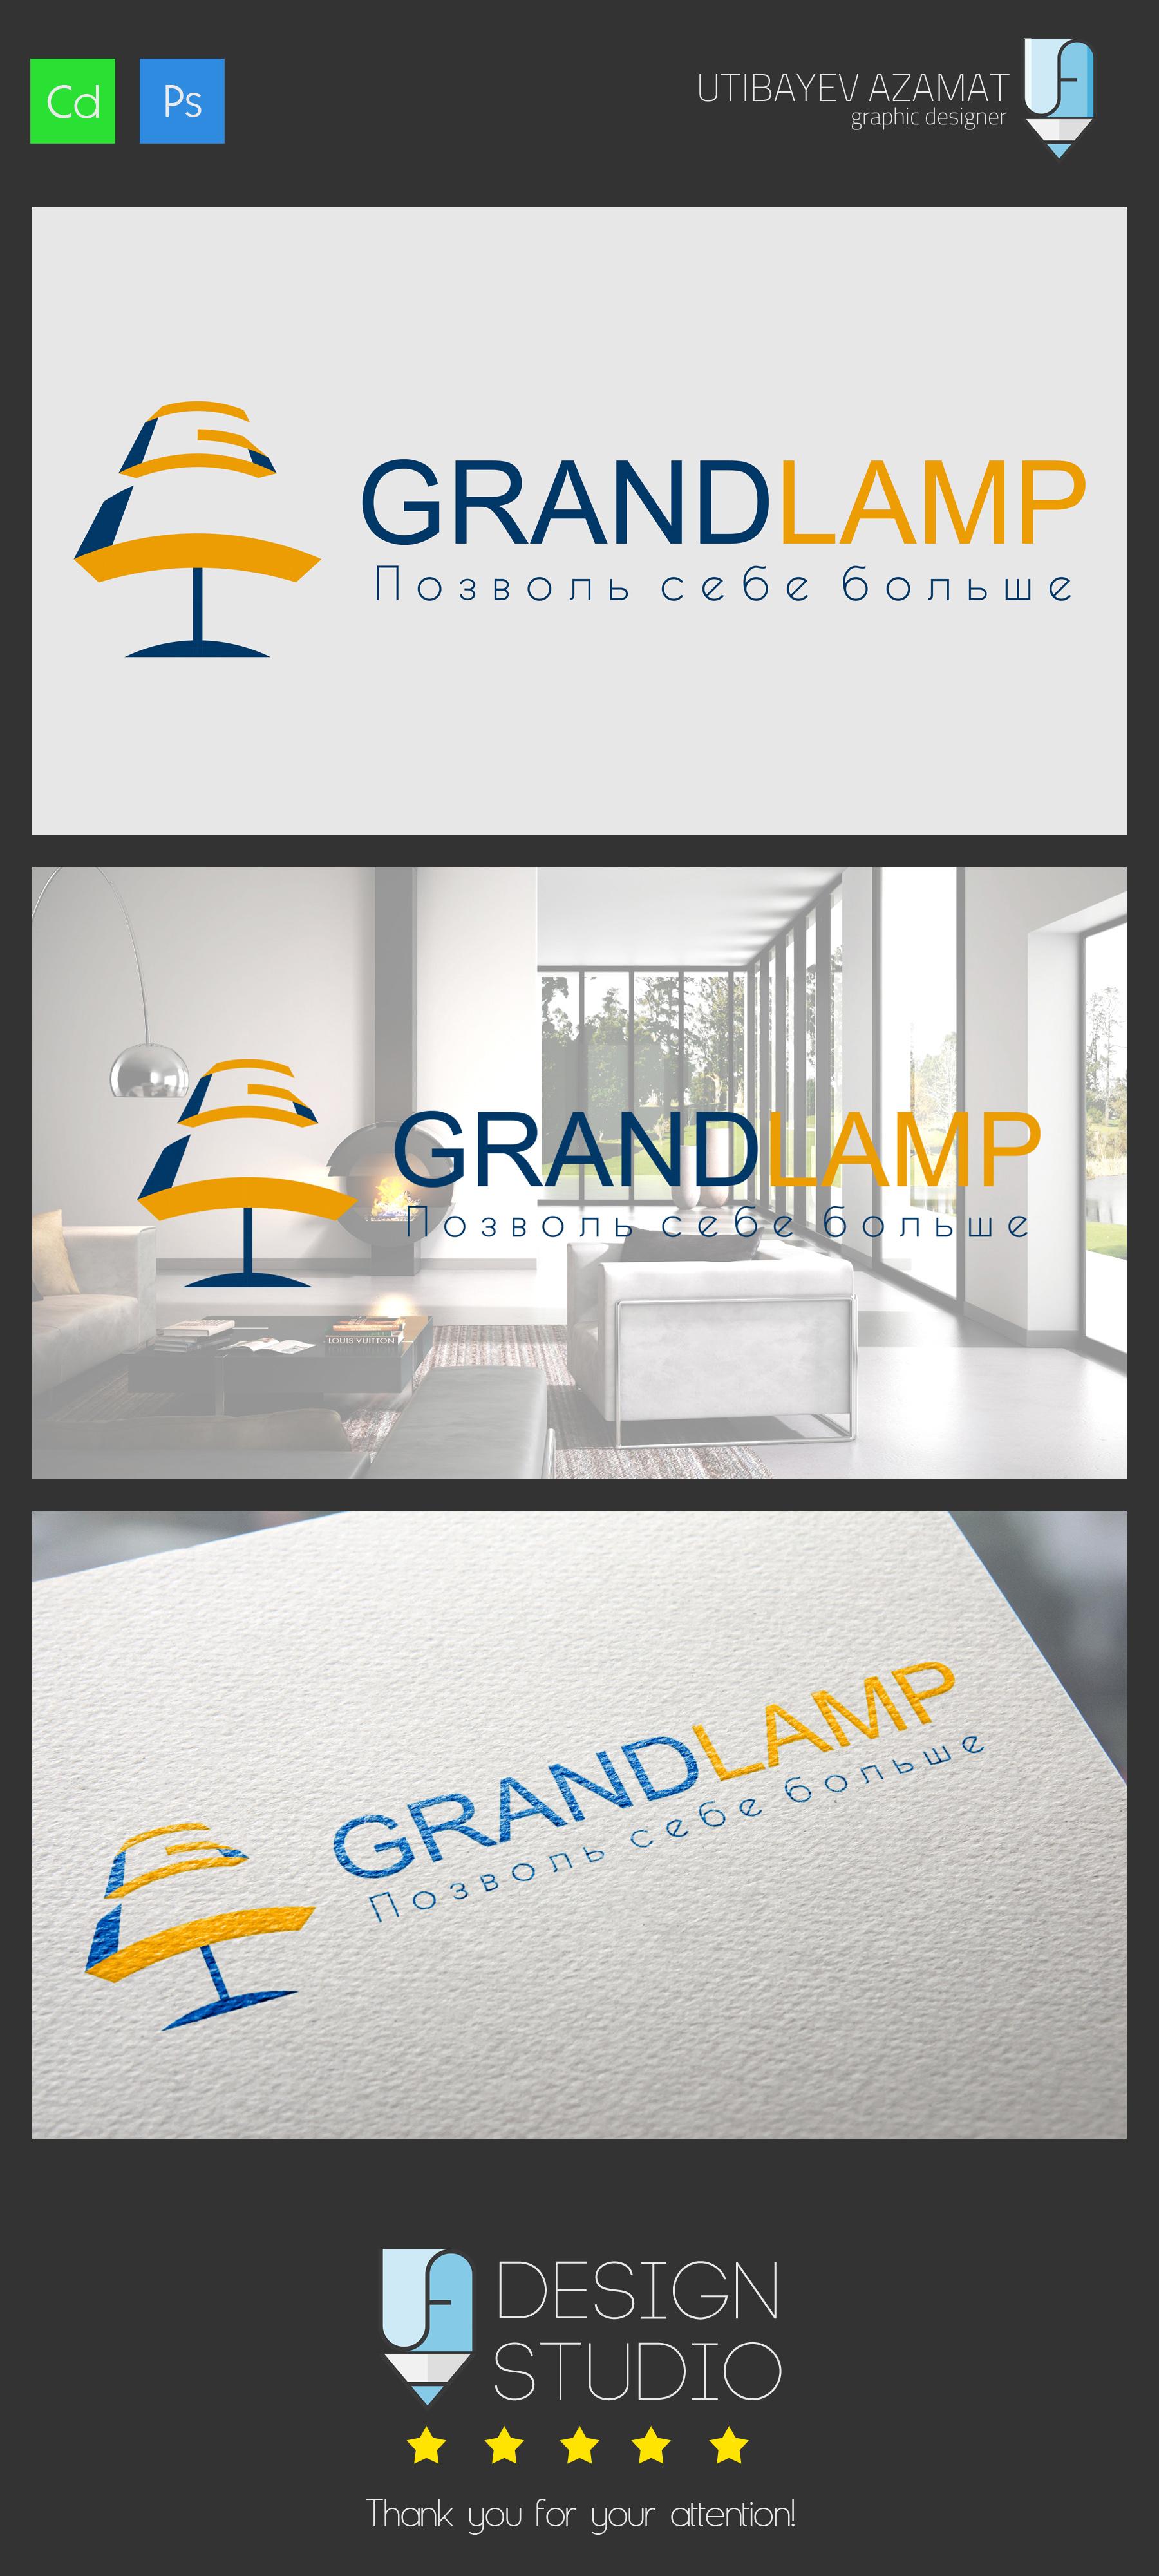 Разработка логотипа и элементов фирменного стиля фото f_17057de8f333115b.jpg